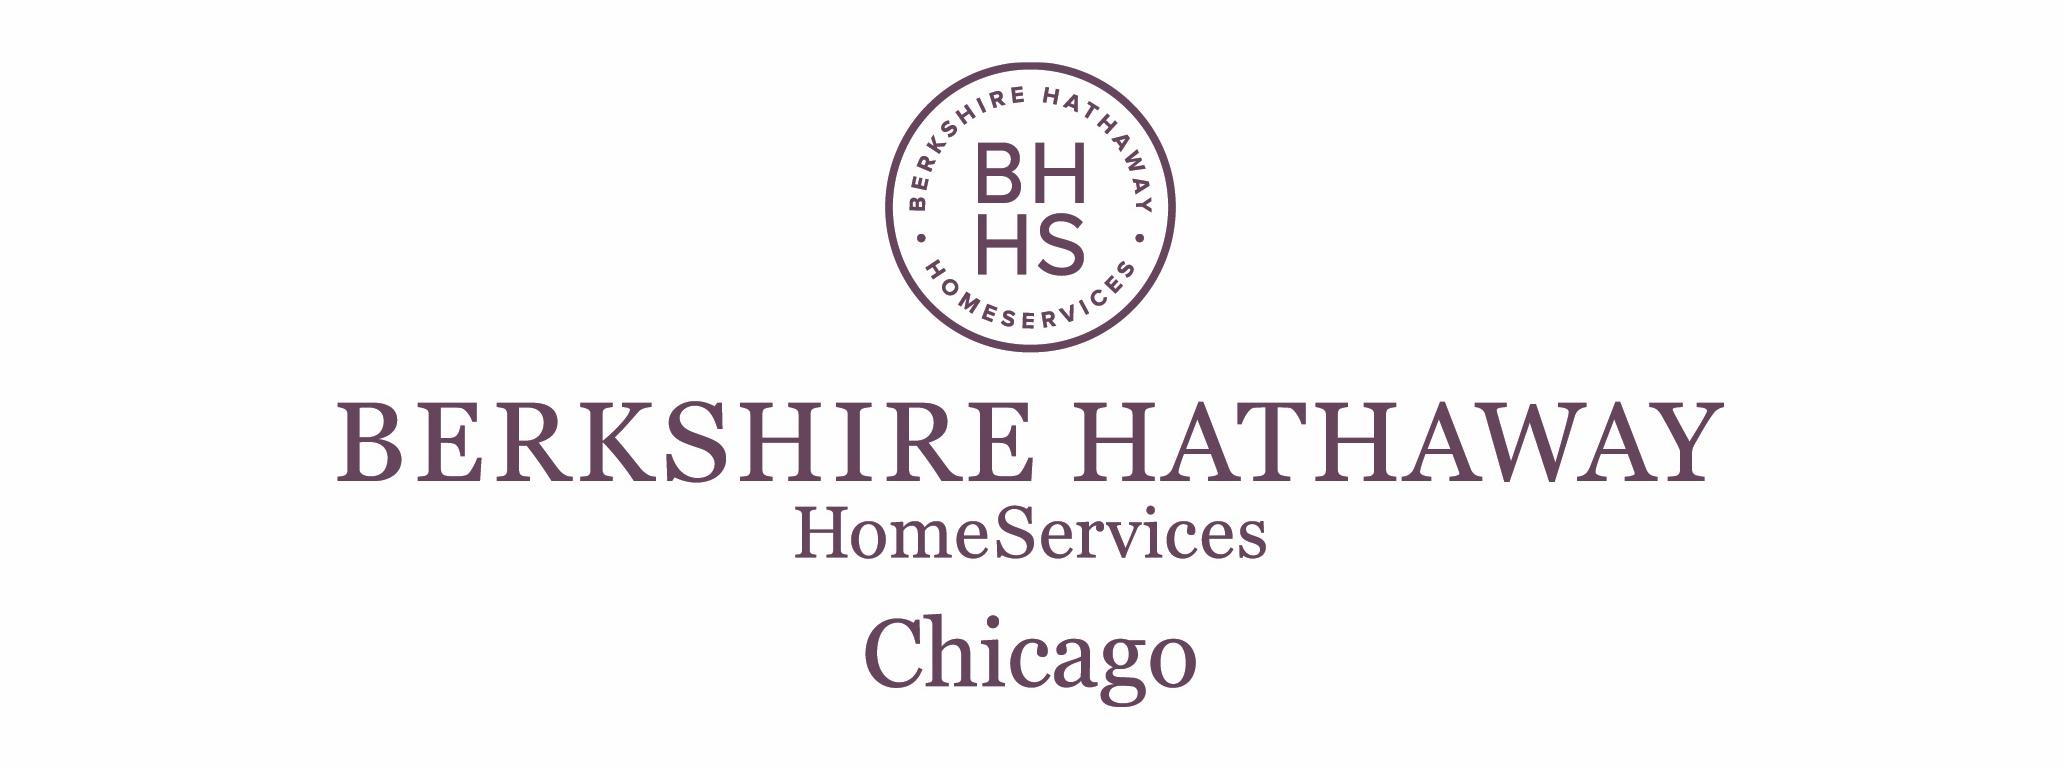 Kurt McAdams Berkshire Hathaway Chicago Reviews, Ratings | Real Estate Services near 564 S. Washington , Naperville IL